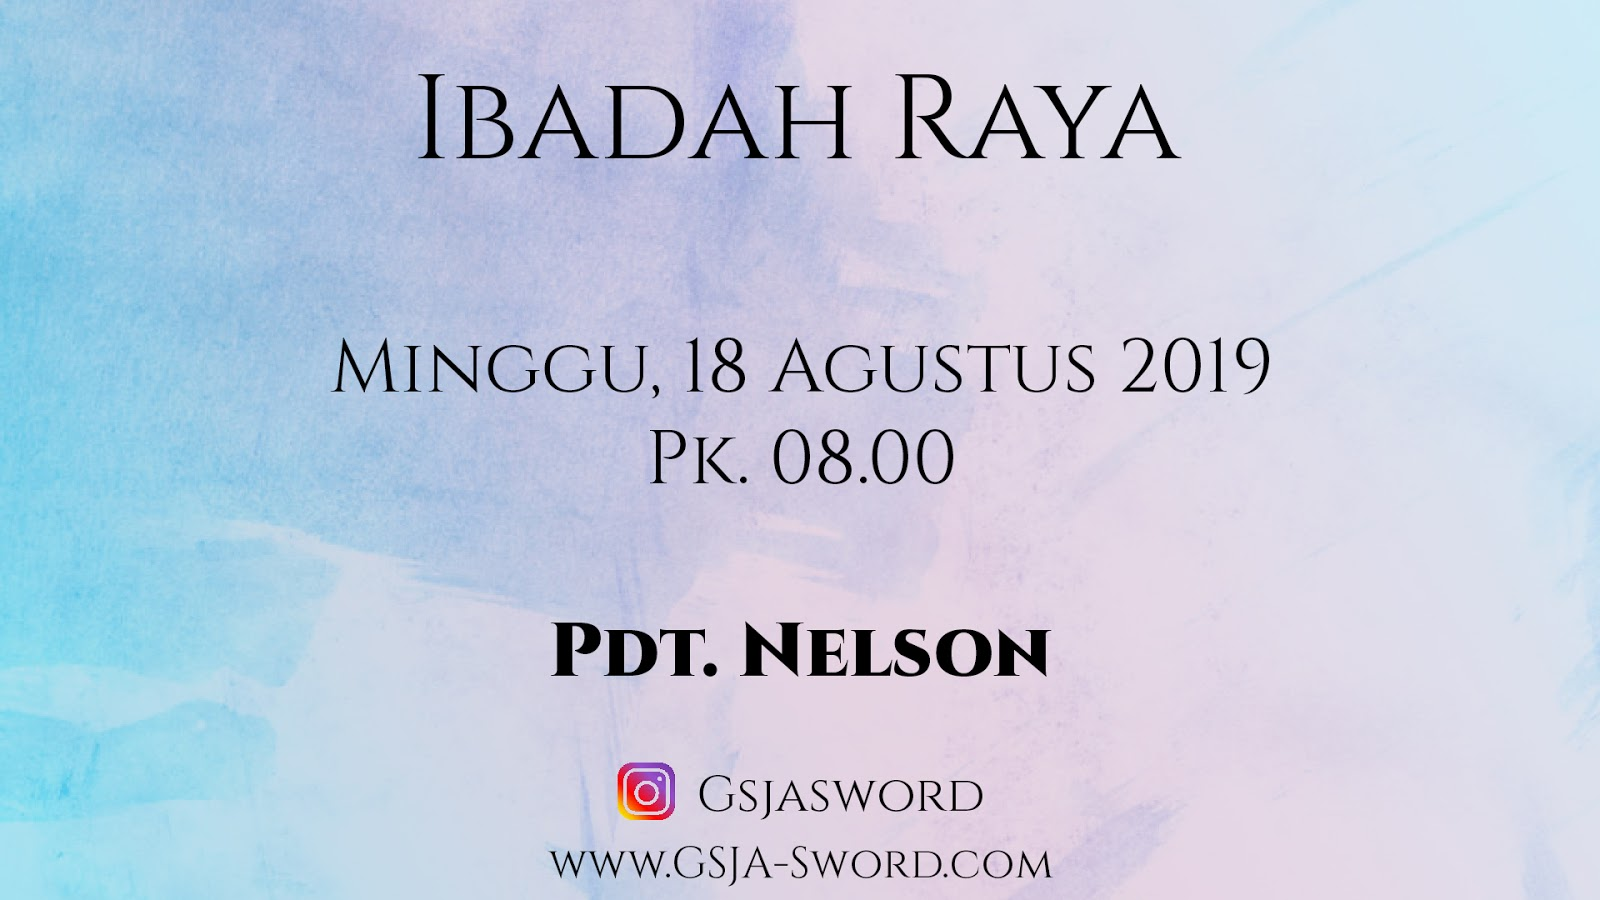 Ibadah Raya GSJA Sword 18 Agustus 2019